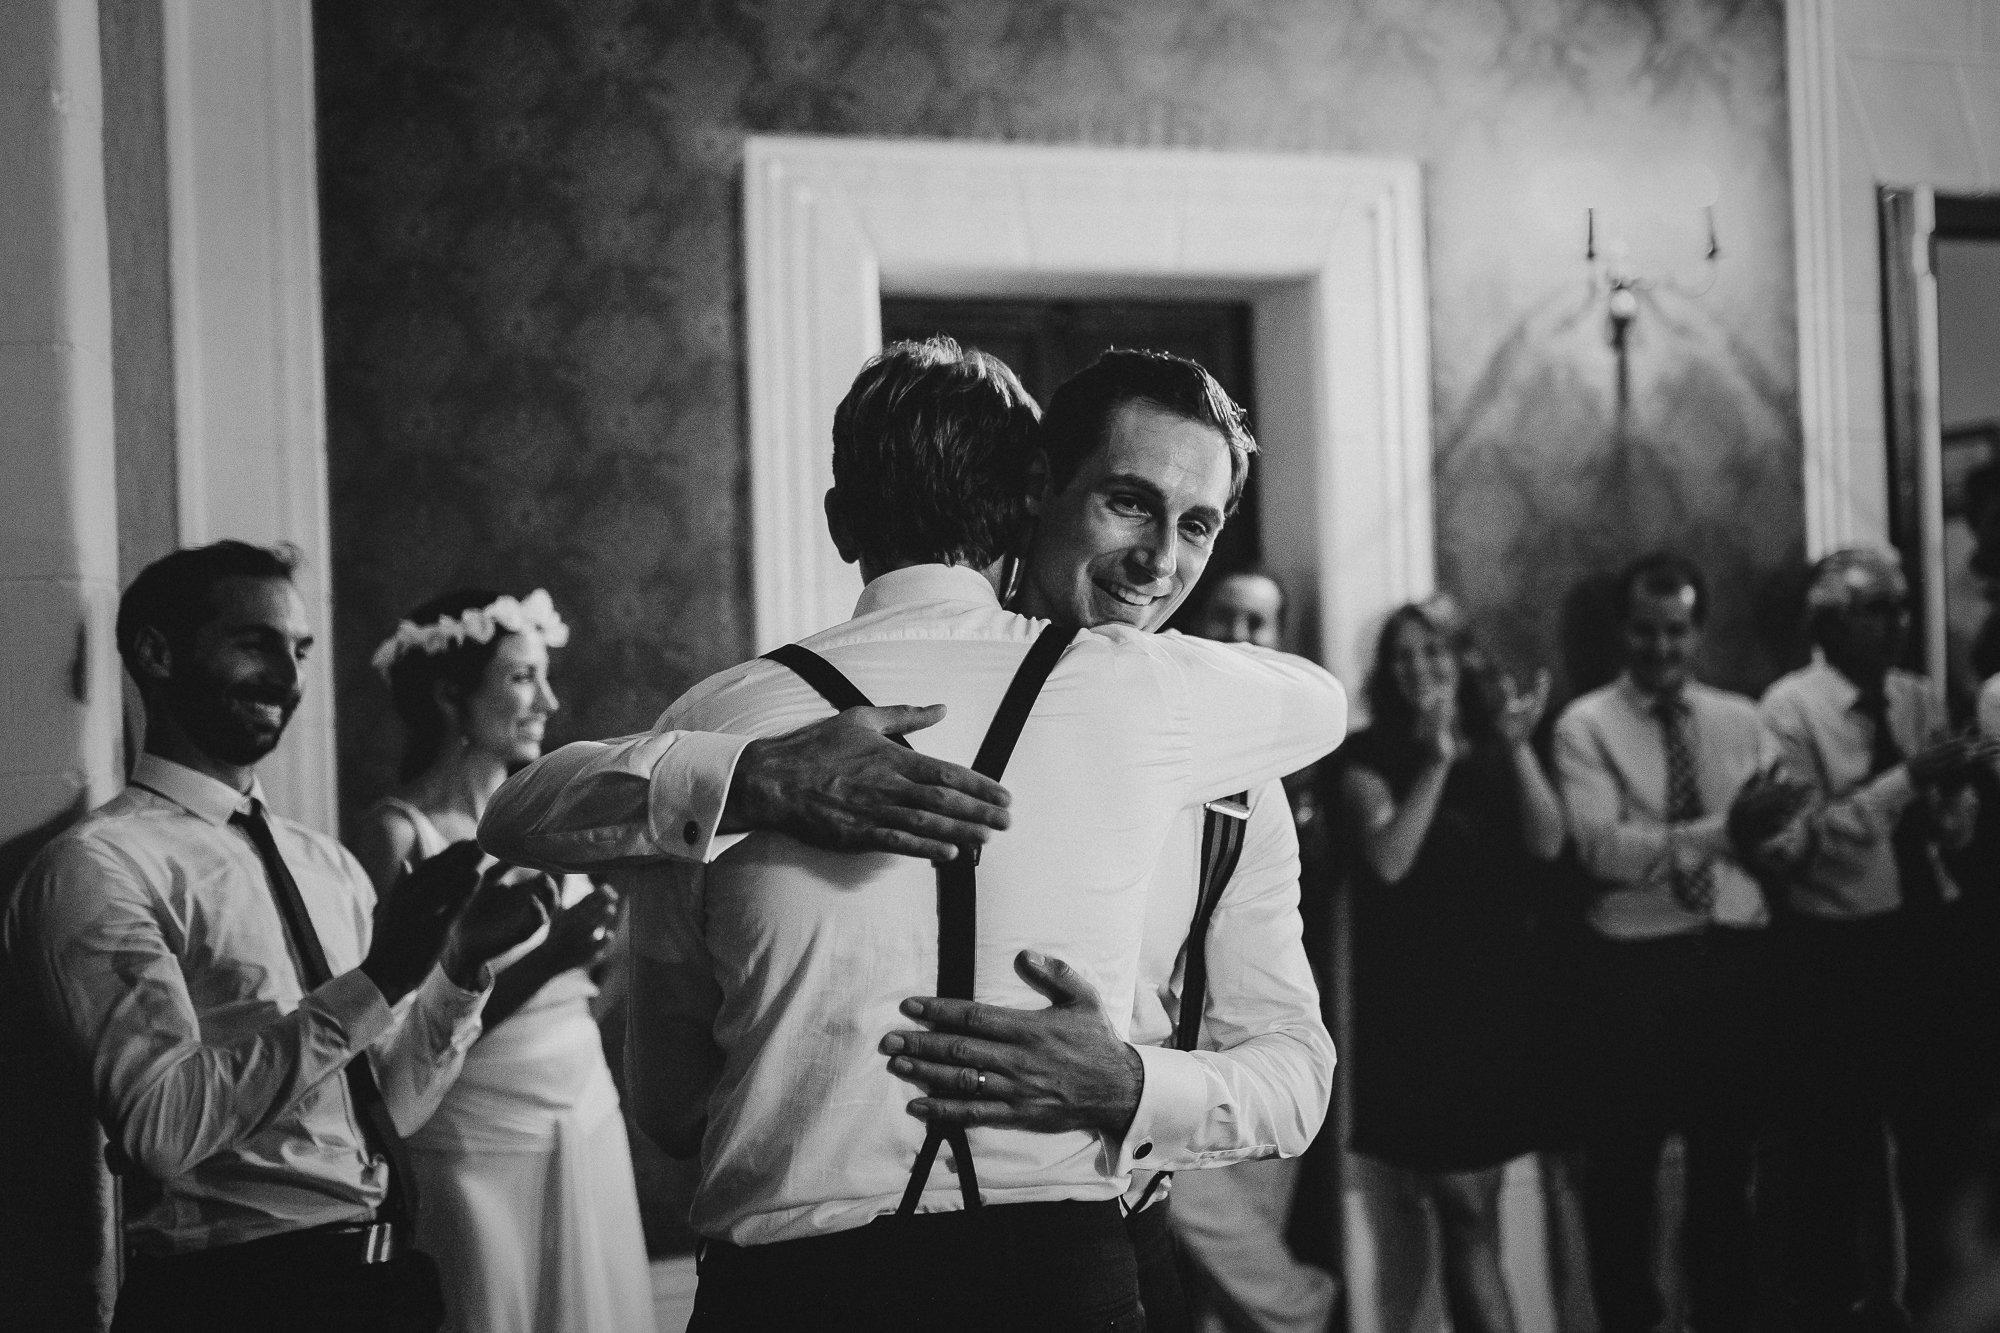 mariage-multiculturel-romantique-withalovelikethat-happymoon (2)